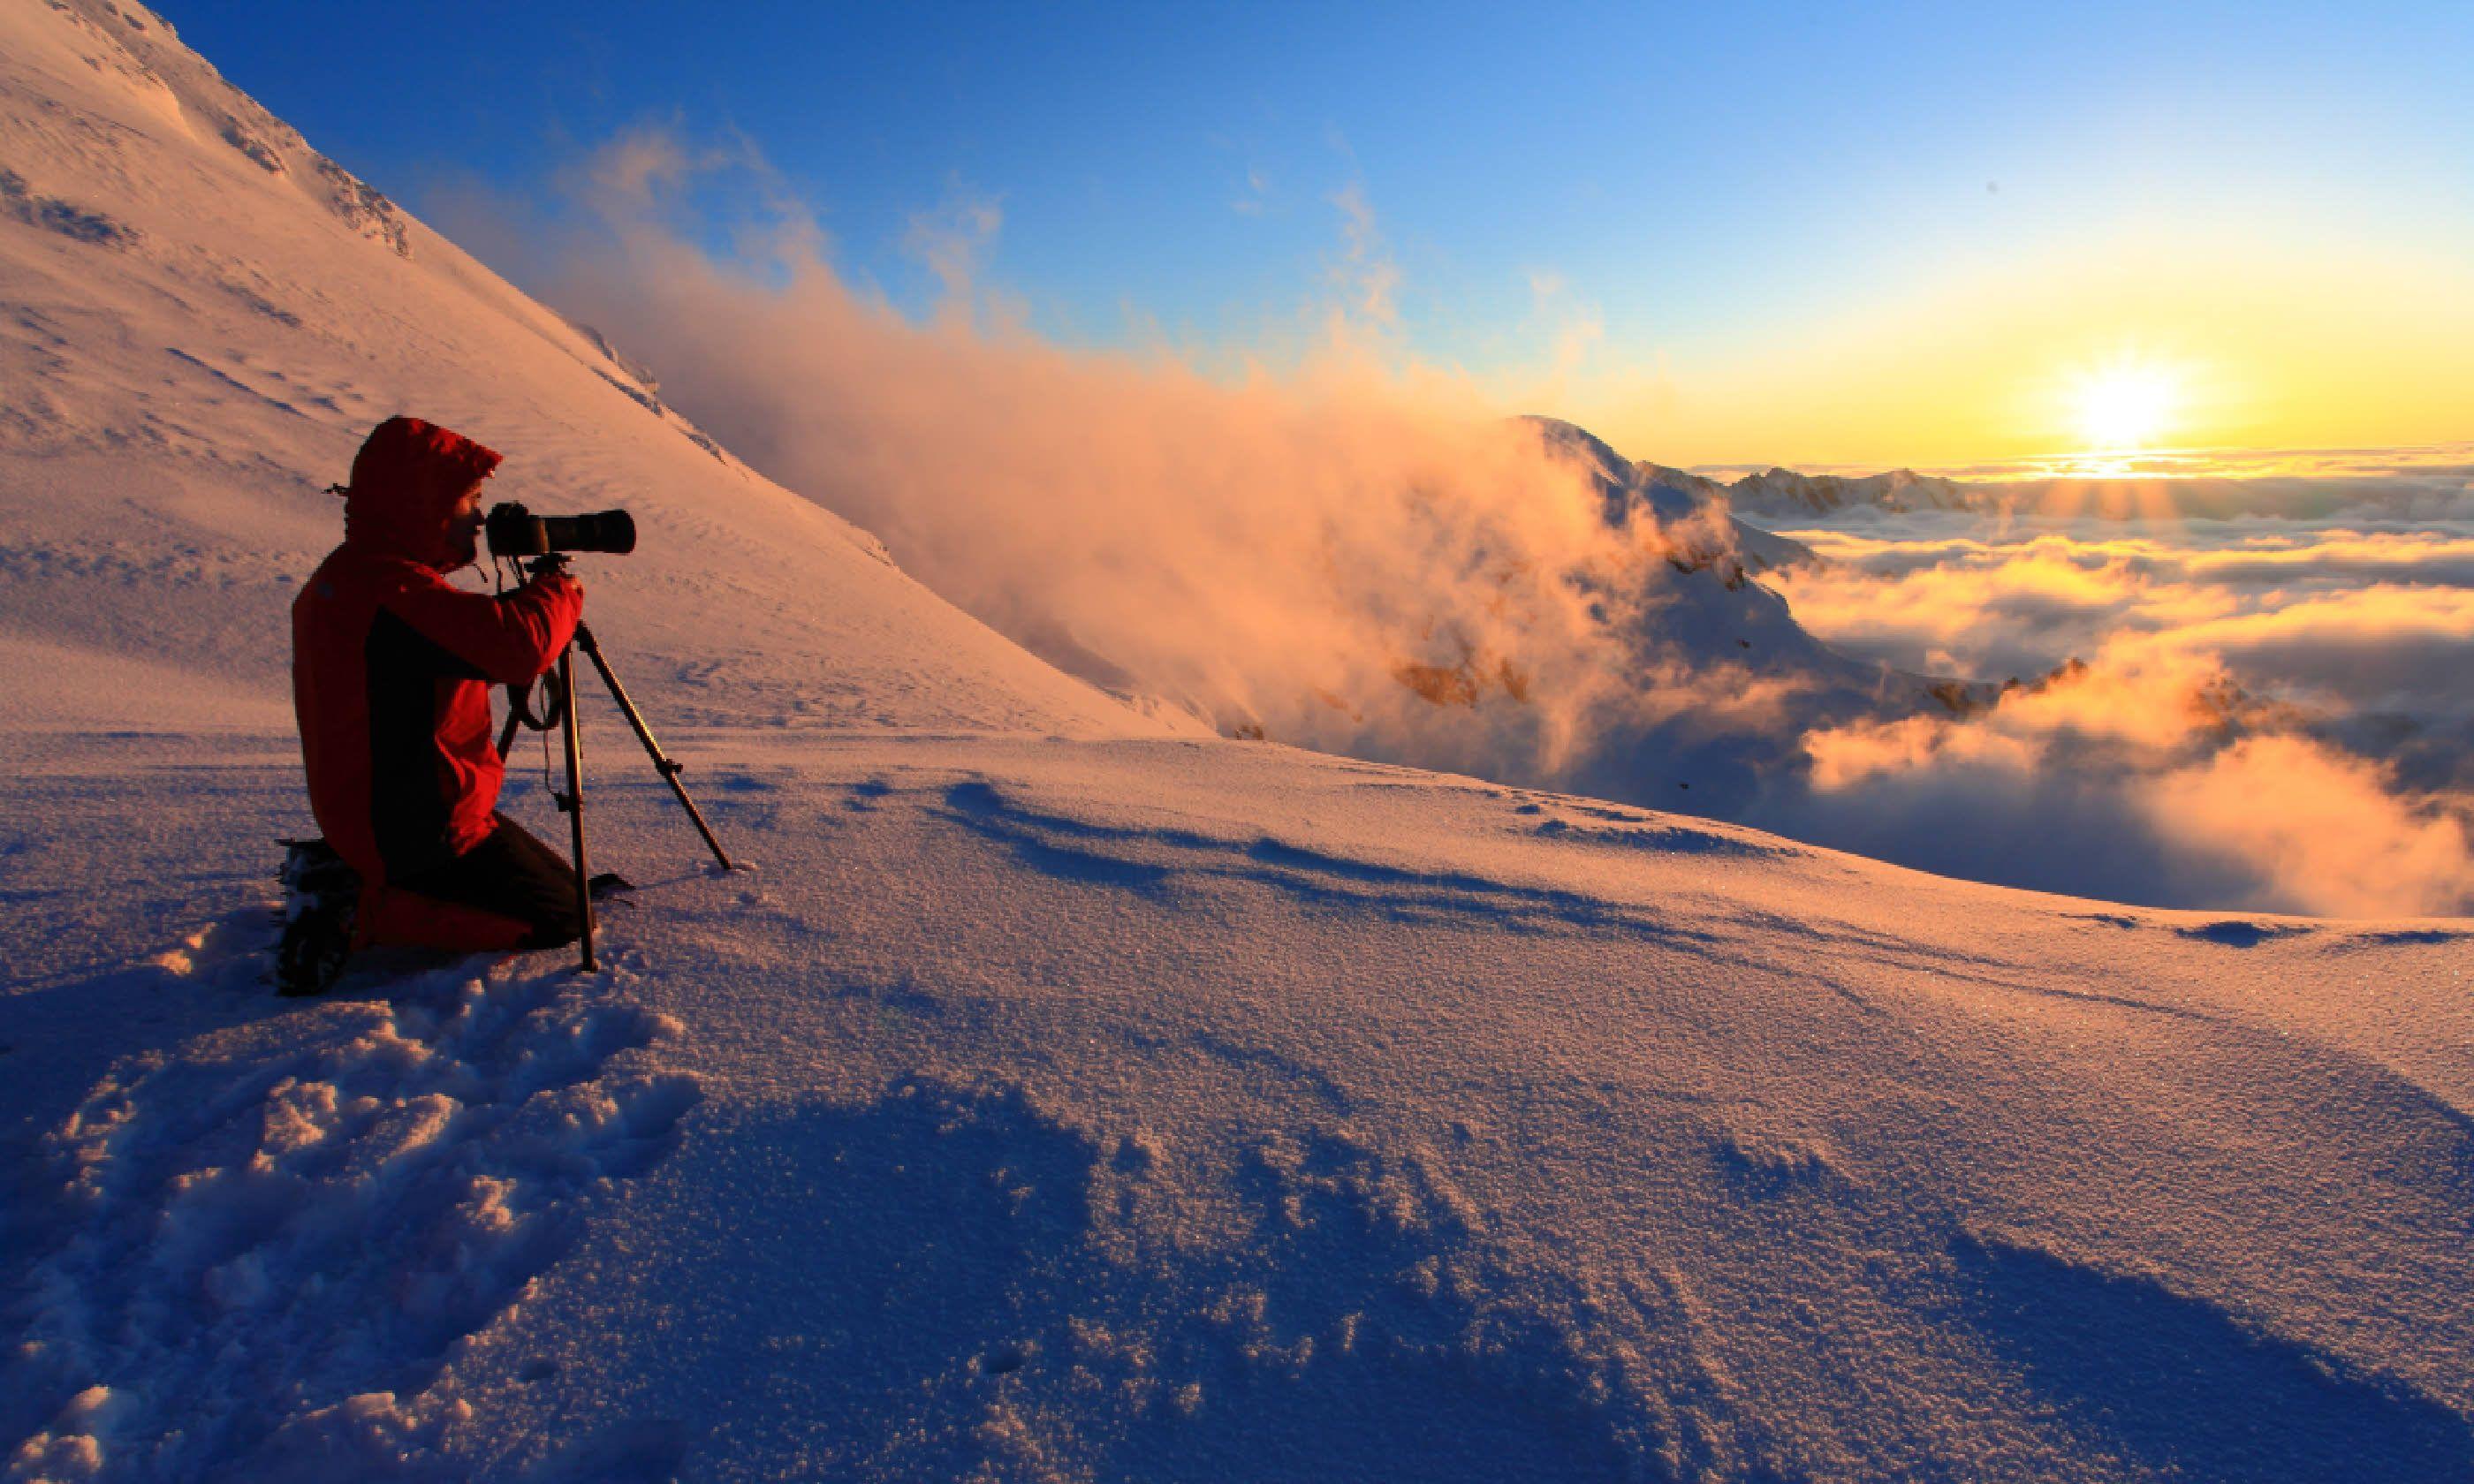 Photographer at sunset (Shutterstock)